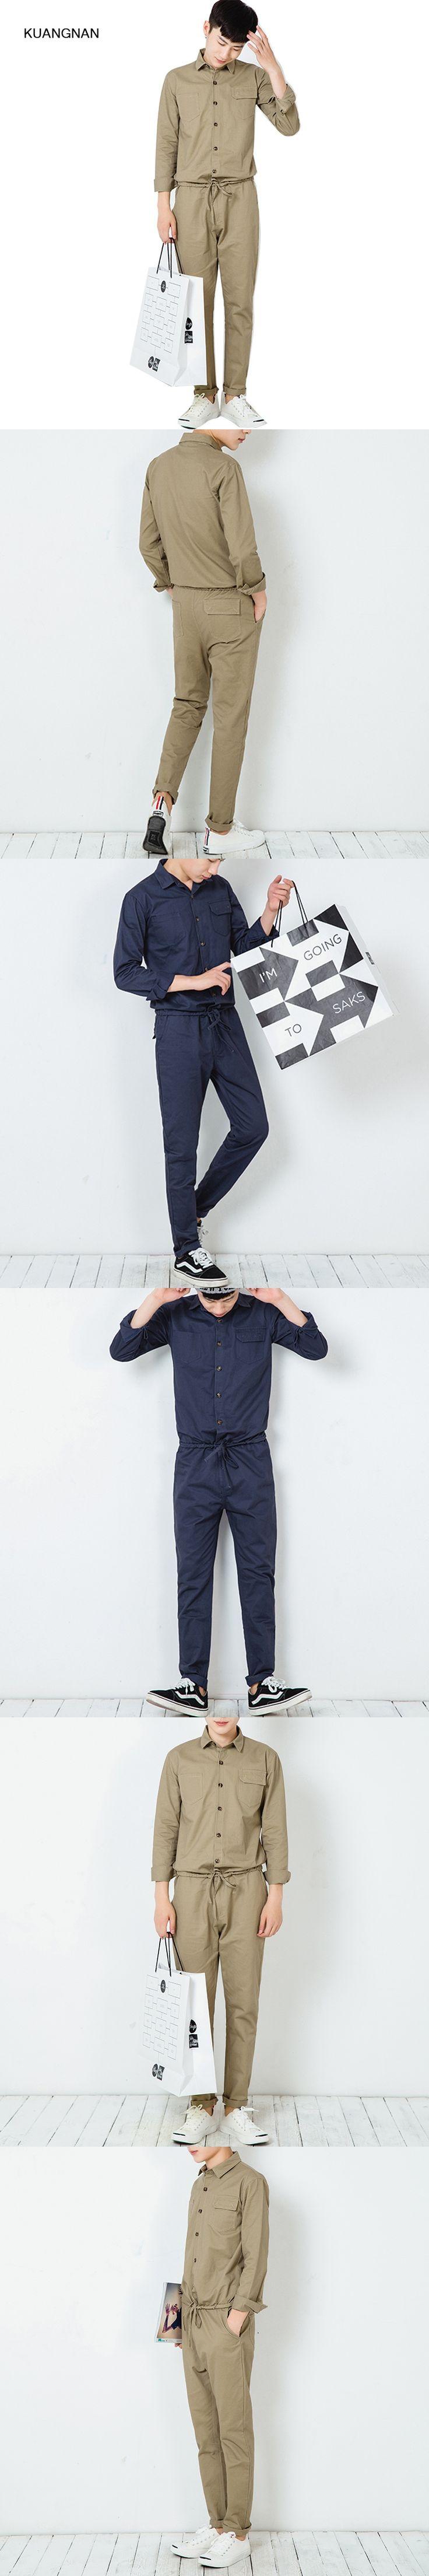 Fashion Casual Men Jumpsuits Street Hip-hop Overalls Trousers Men Long Sleeve Shirt Tooling Harem Pant Jumpsuits